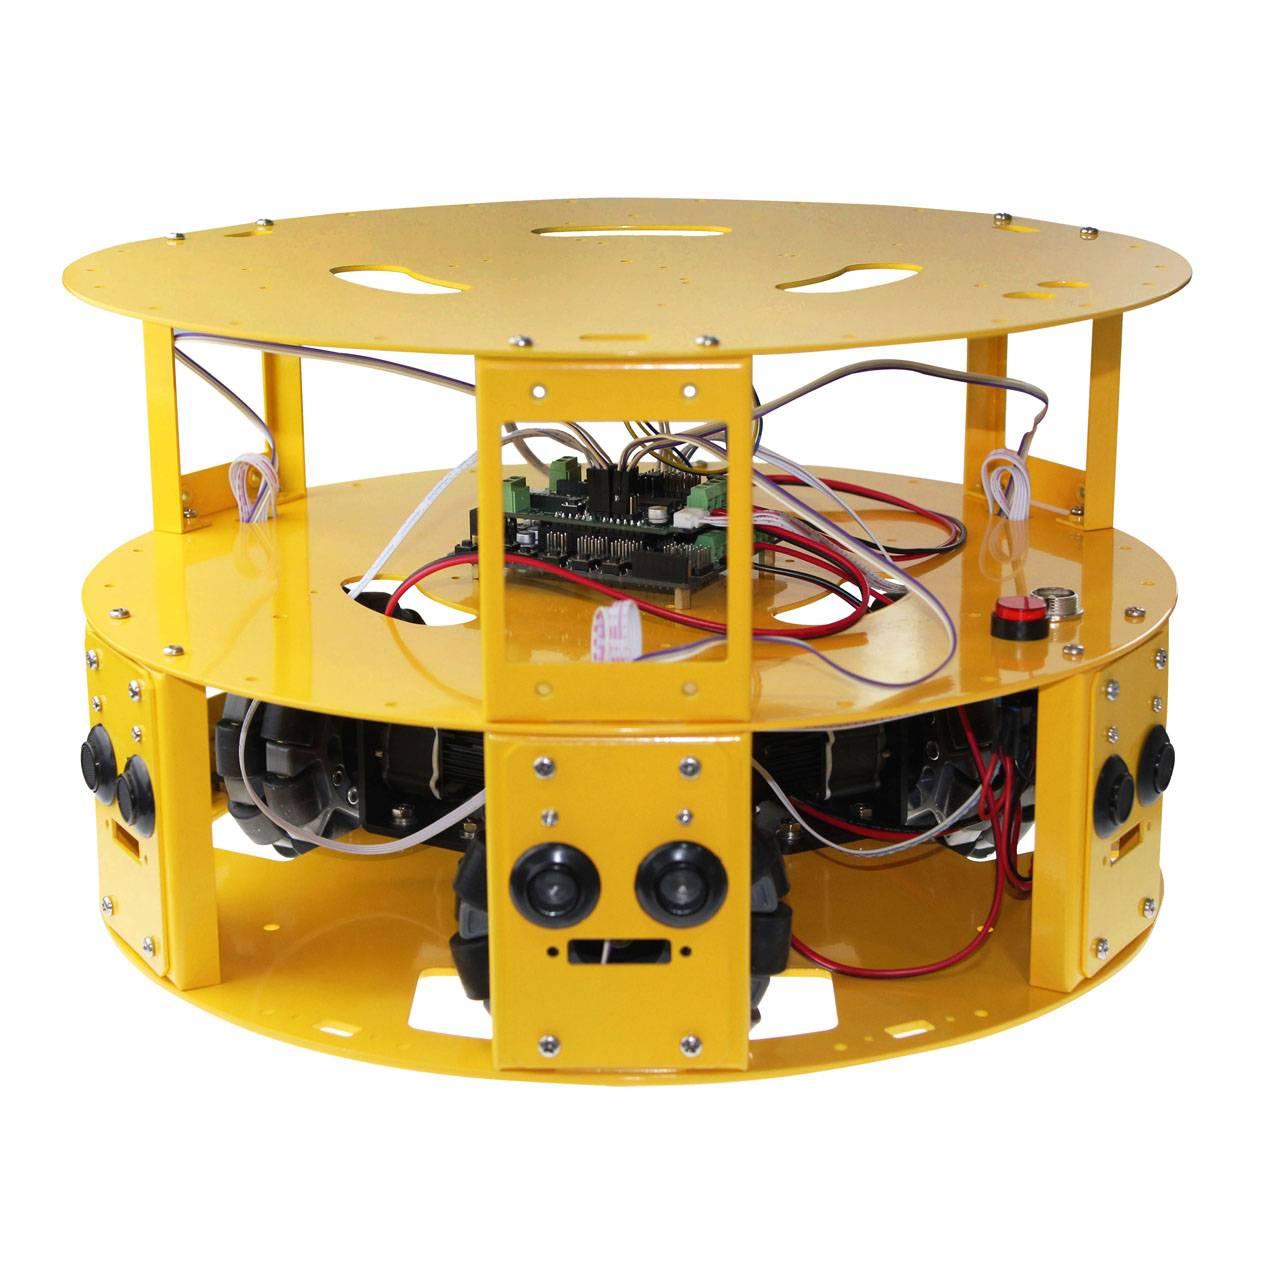 3WD 100mm Omni Wheel Arduino robotics car 10006